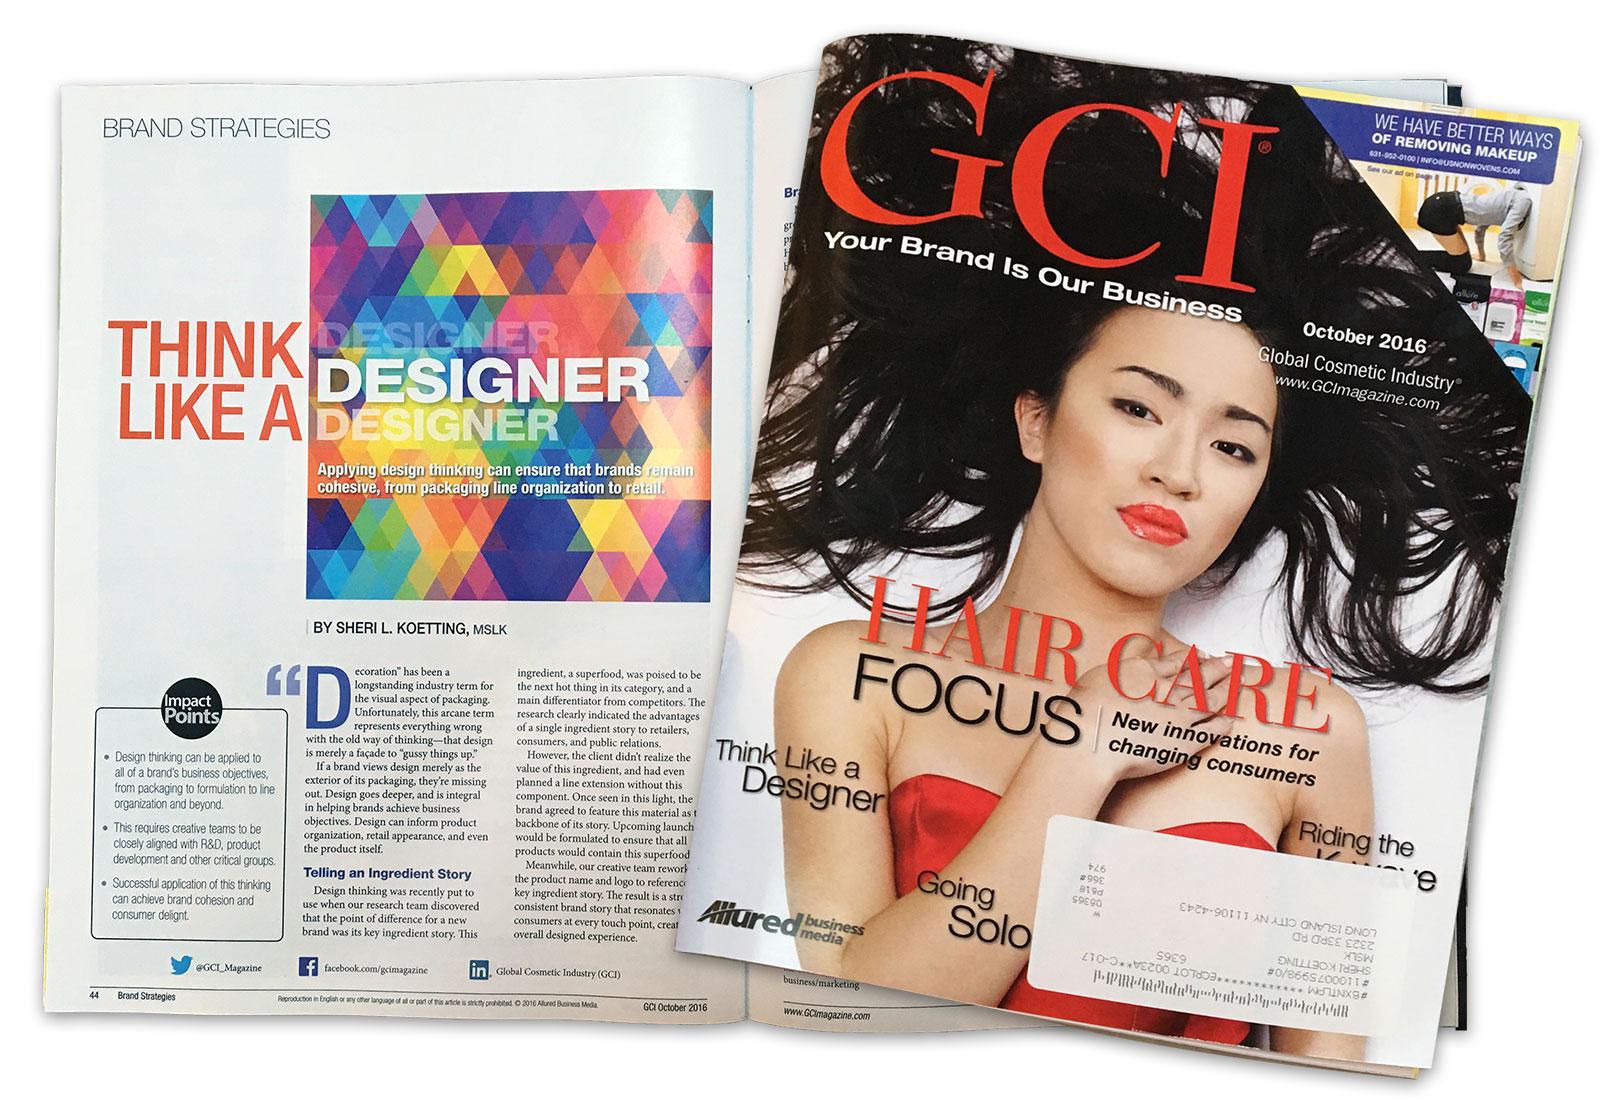 GCI Article: Design Thinking